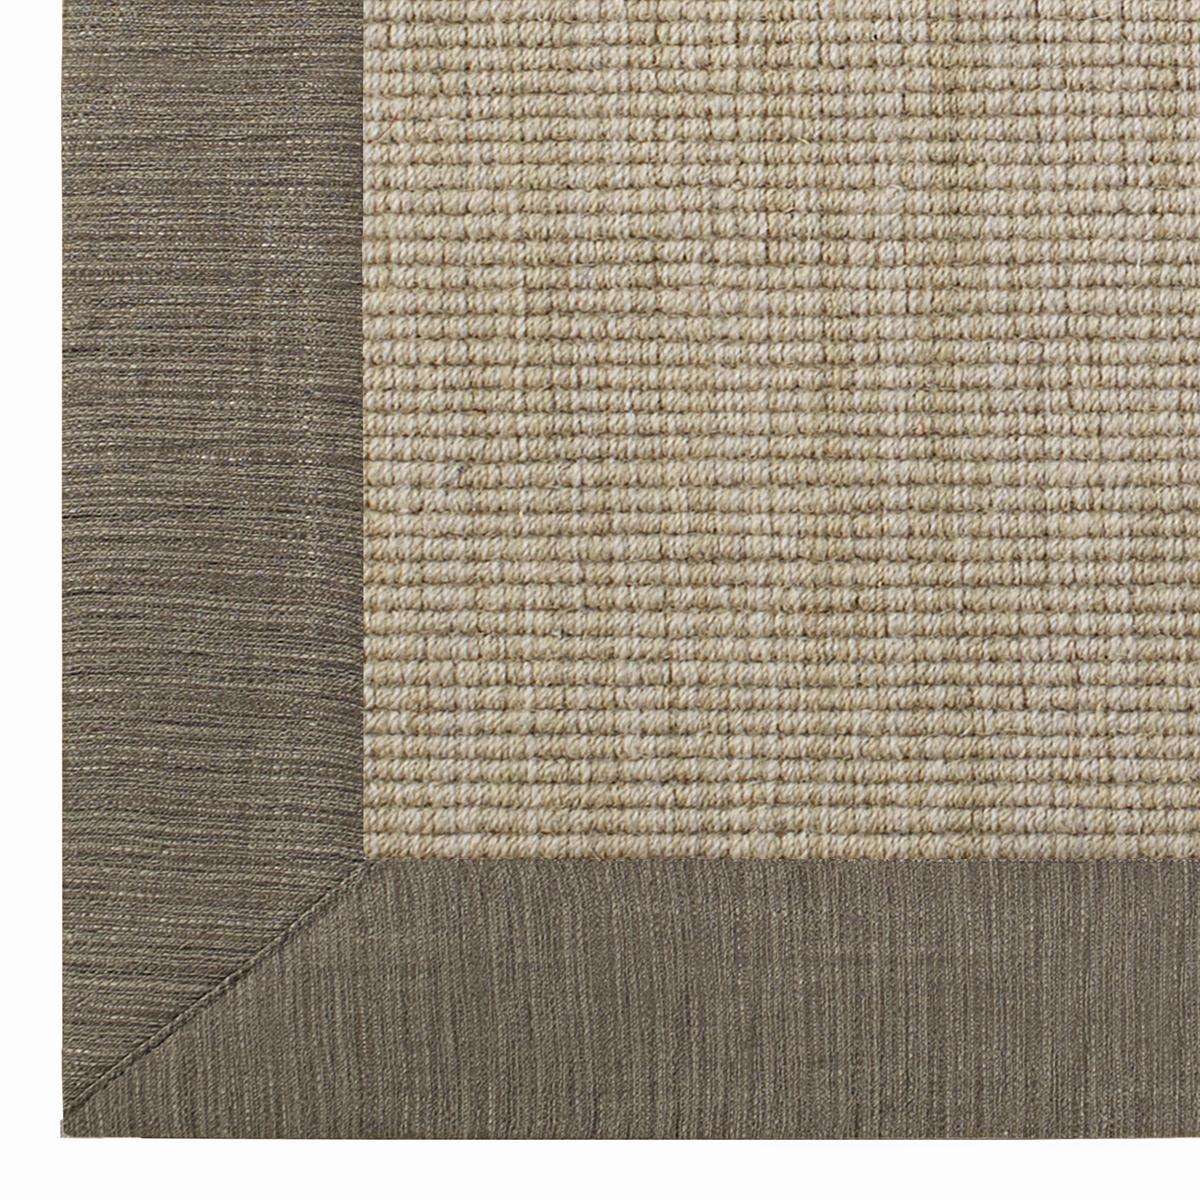 Linen Texture Border Wool Sisal Rug Sisal Rugs Sisal